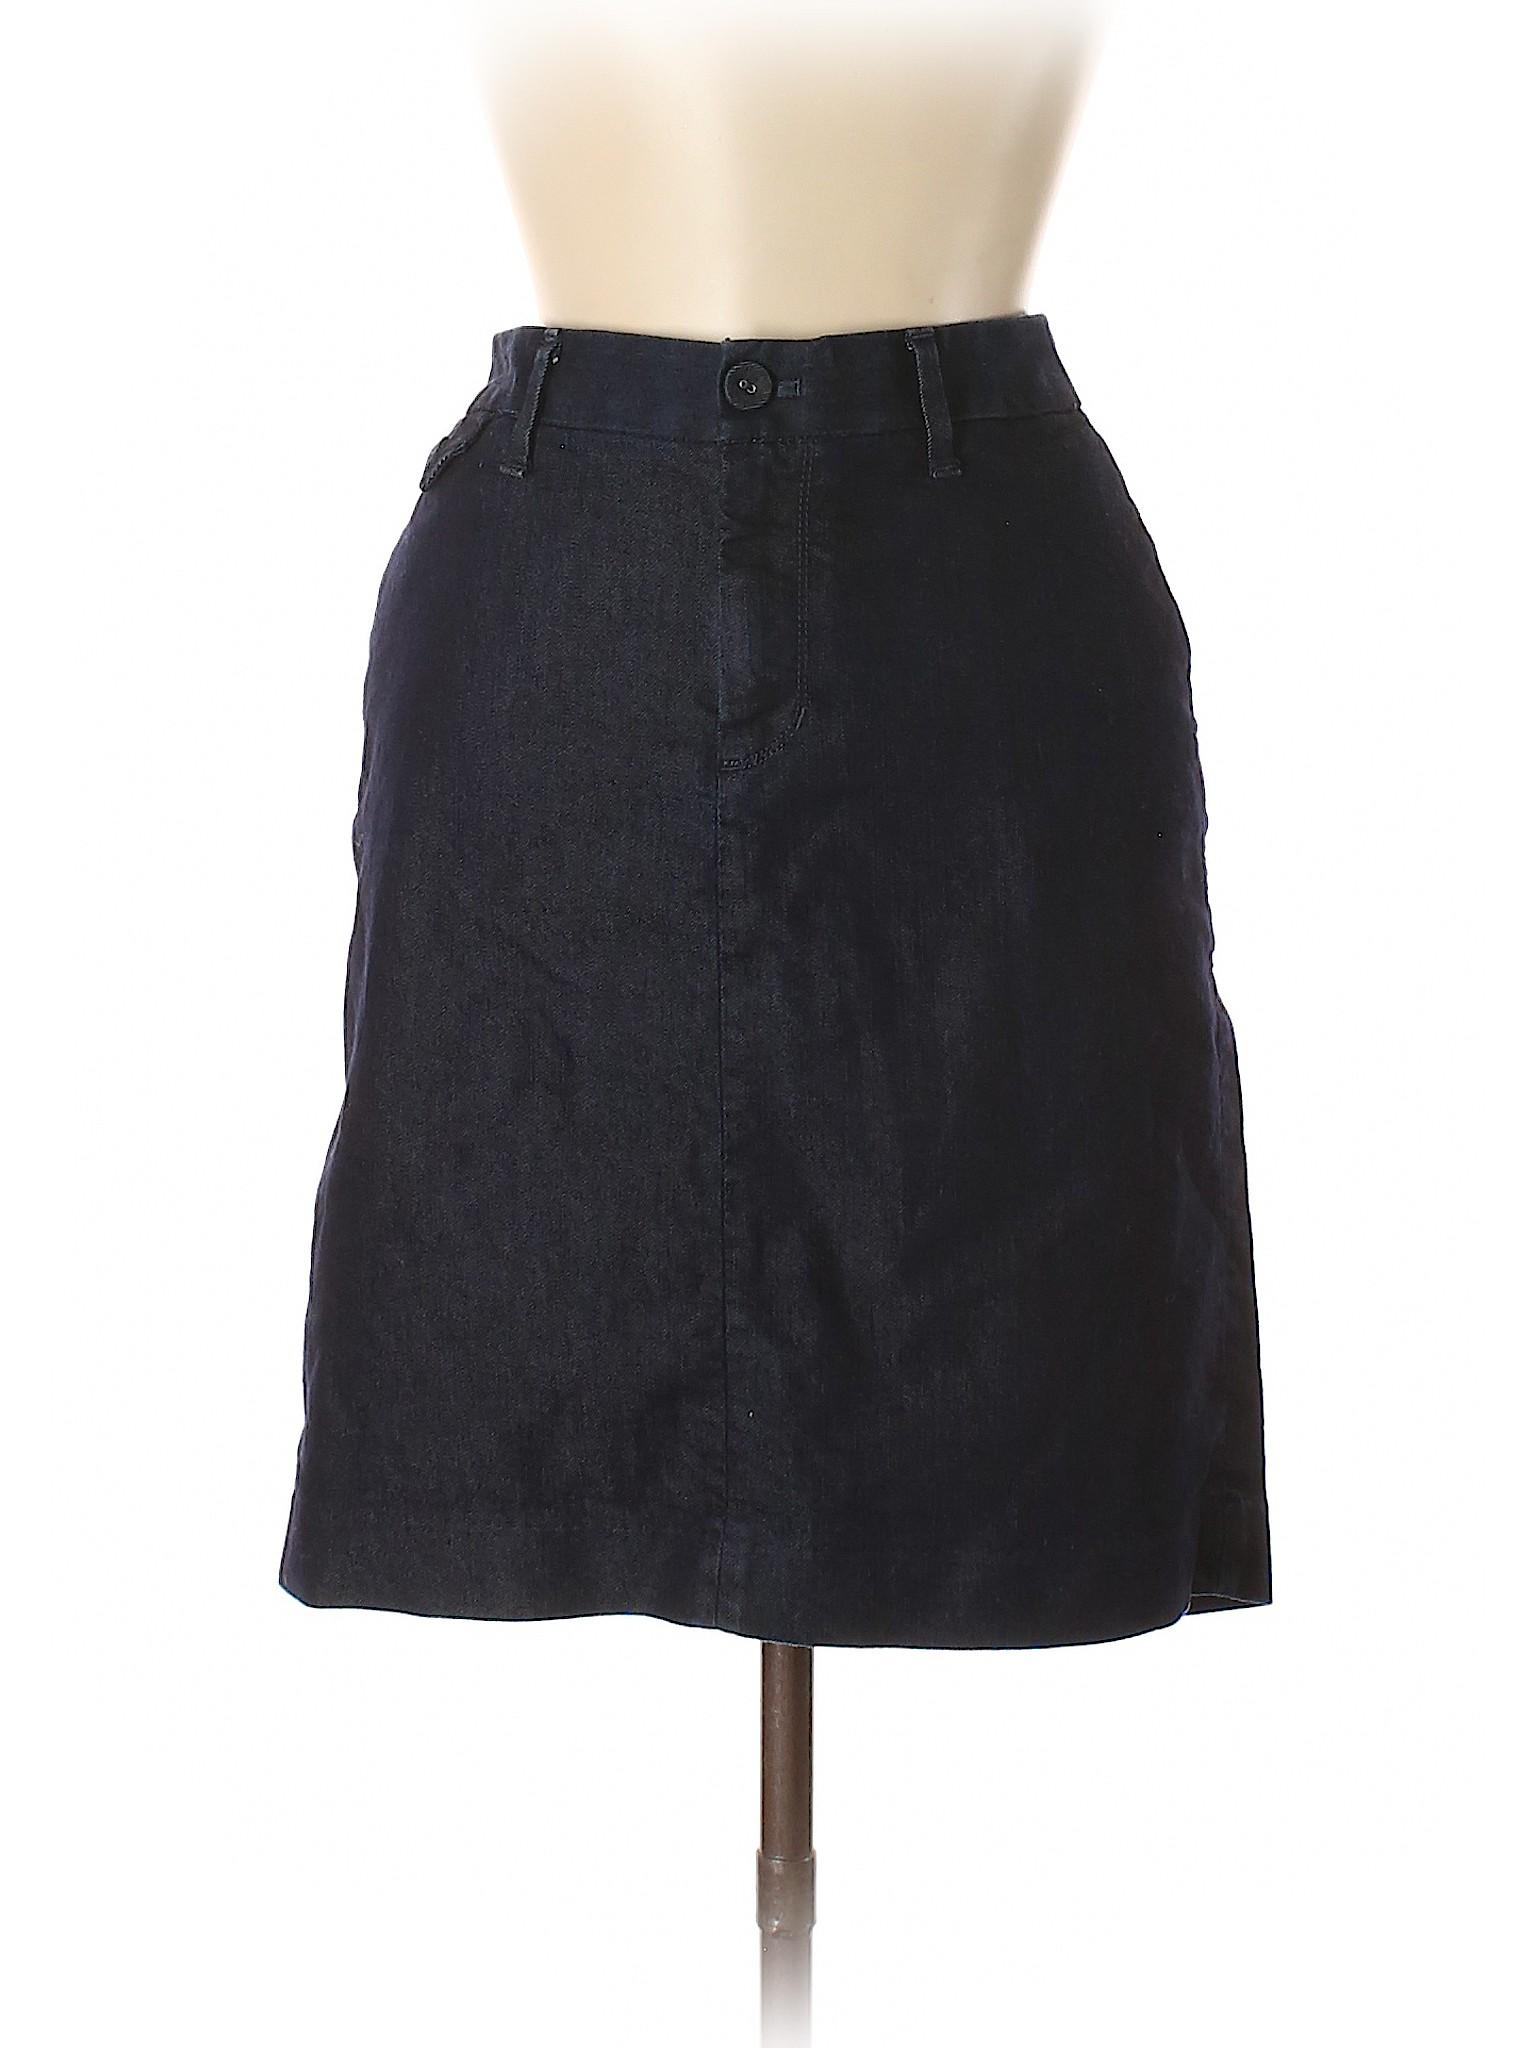 Leisure Banana Denim Republic Store winter Skirt Factory O5wr6Oq